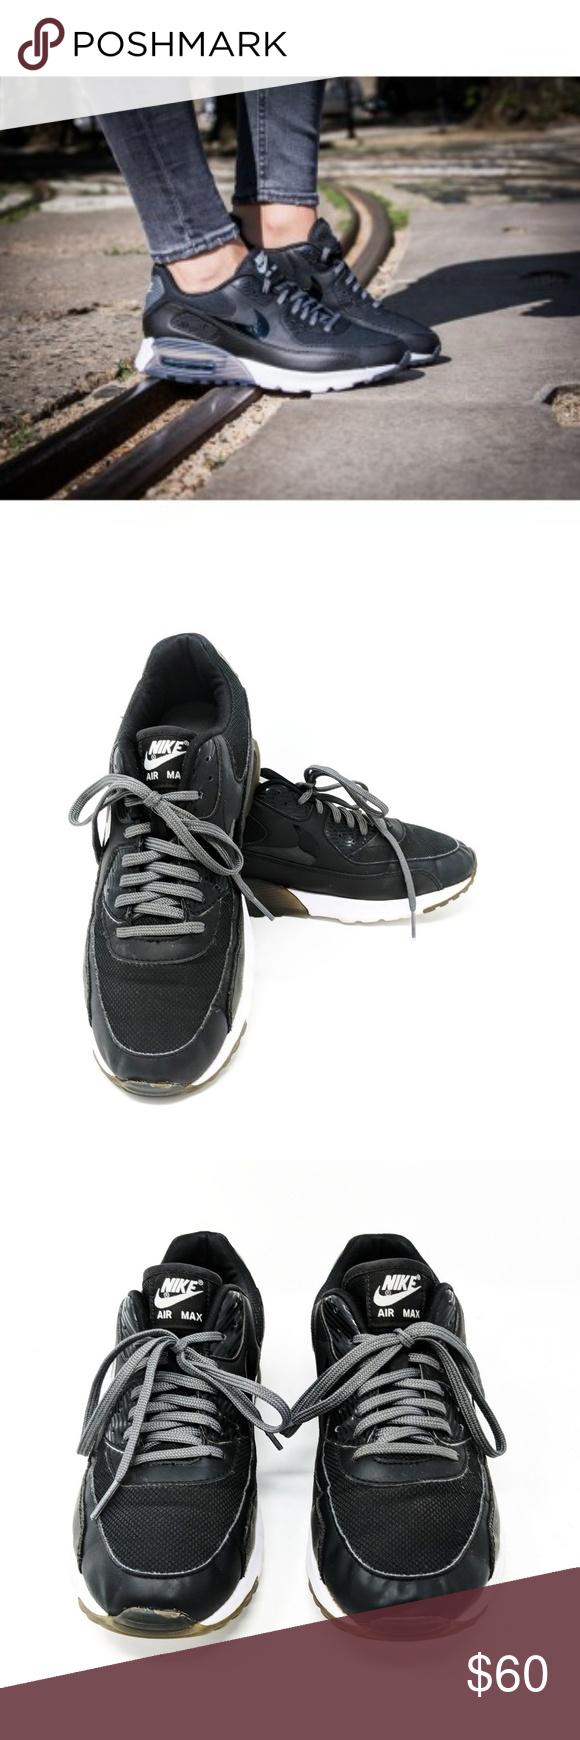 NIKE AIR MAX 90 Ultra Essential Sneakers Size 10 Nike Air